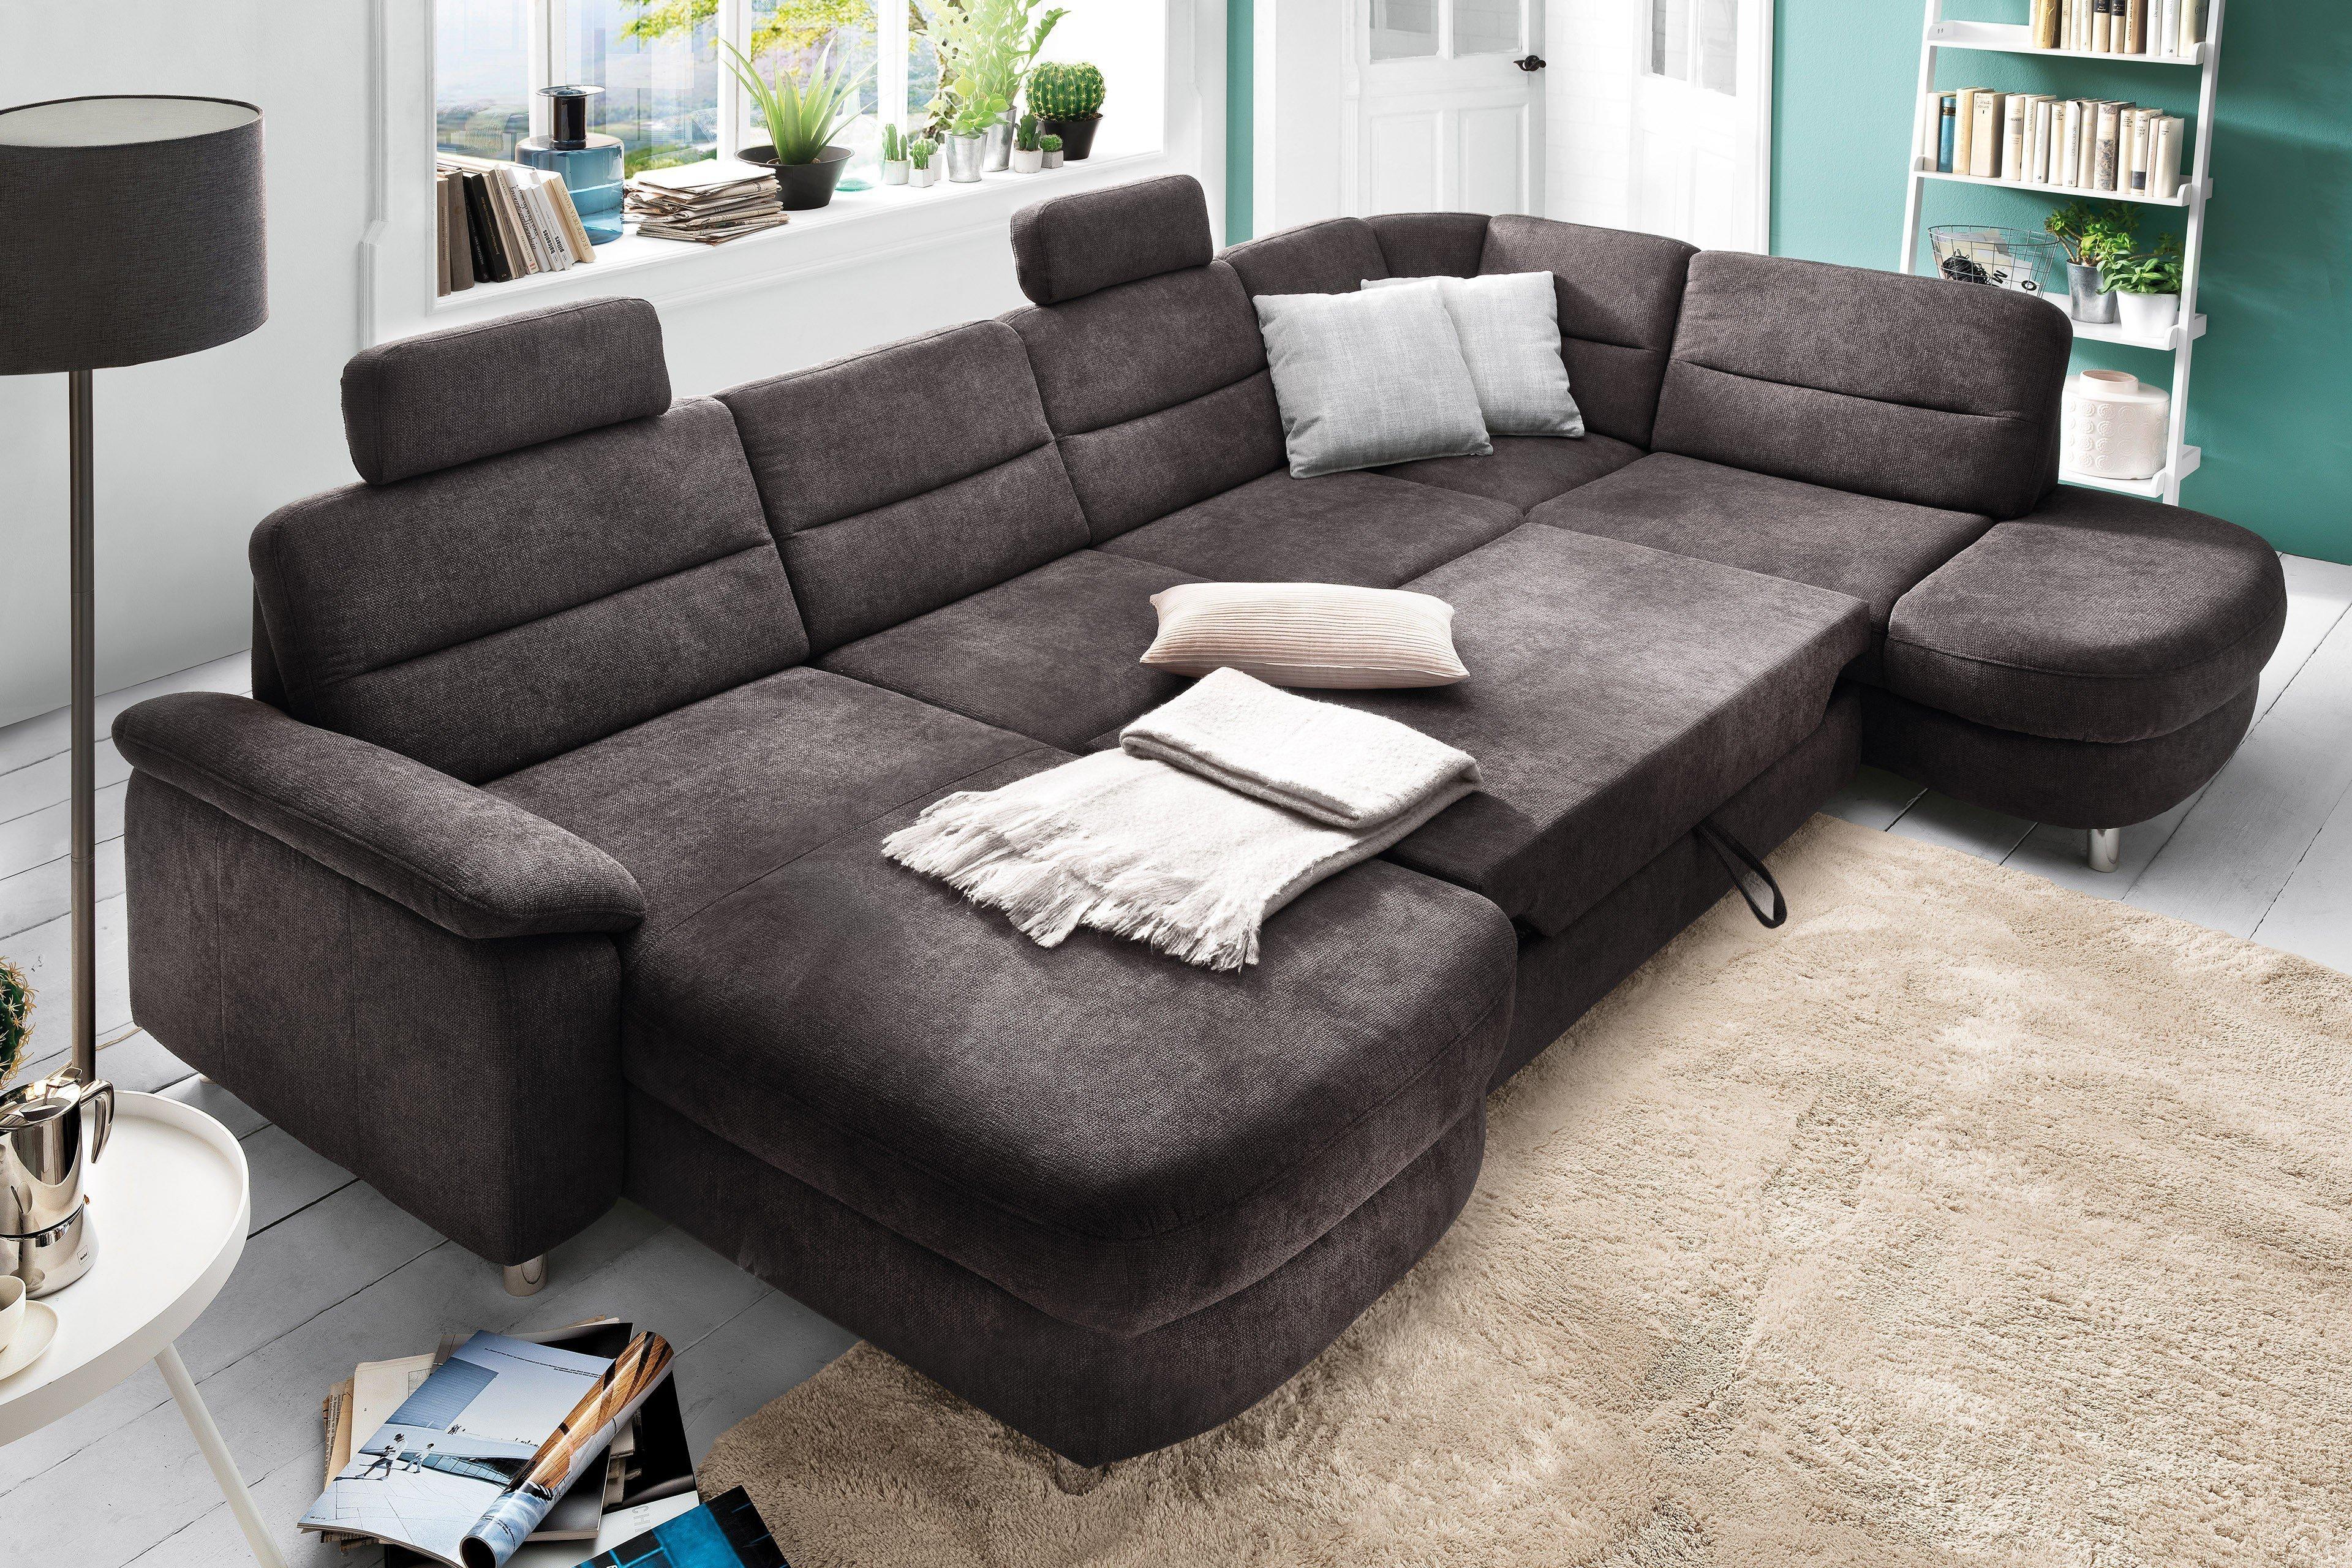 Online Moebel Kaufen De Shop Images Product Images